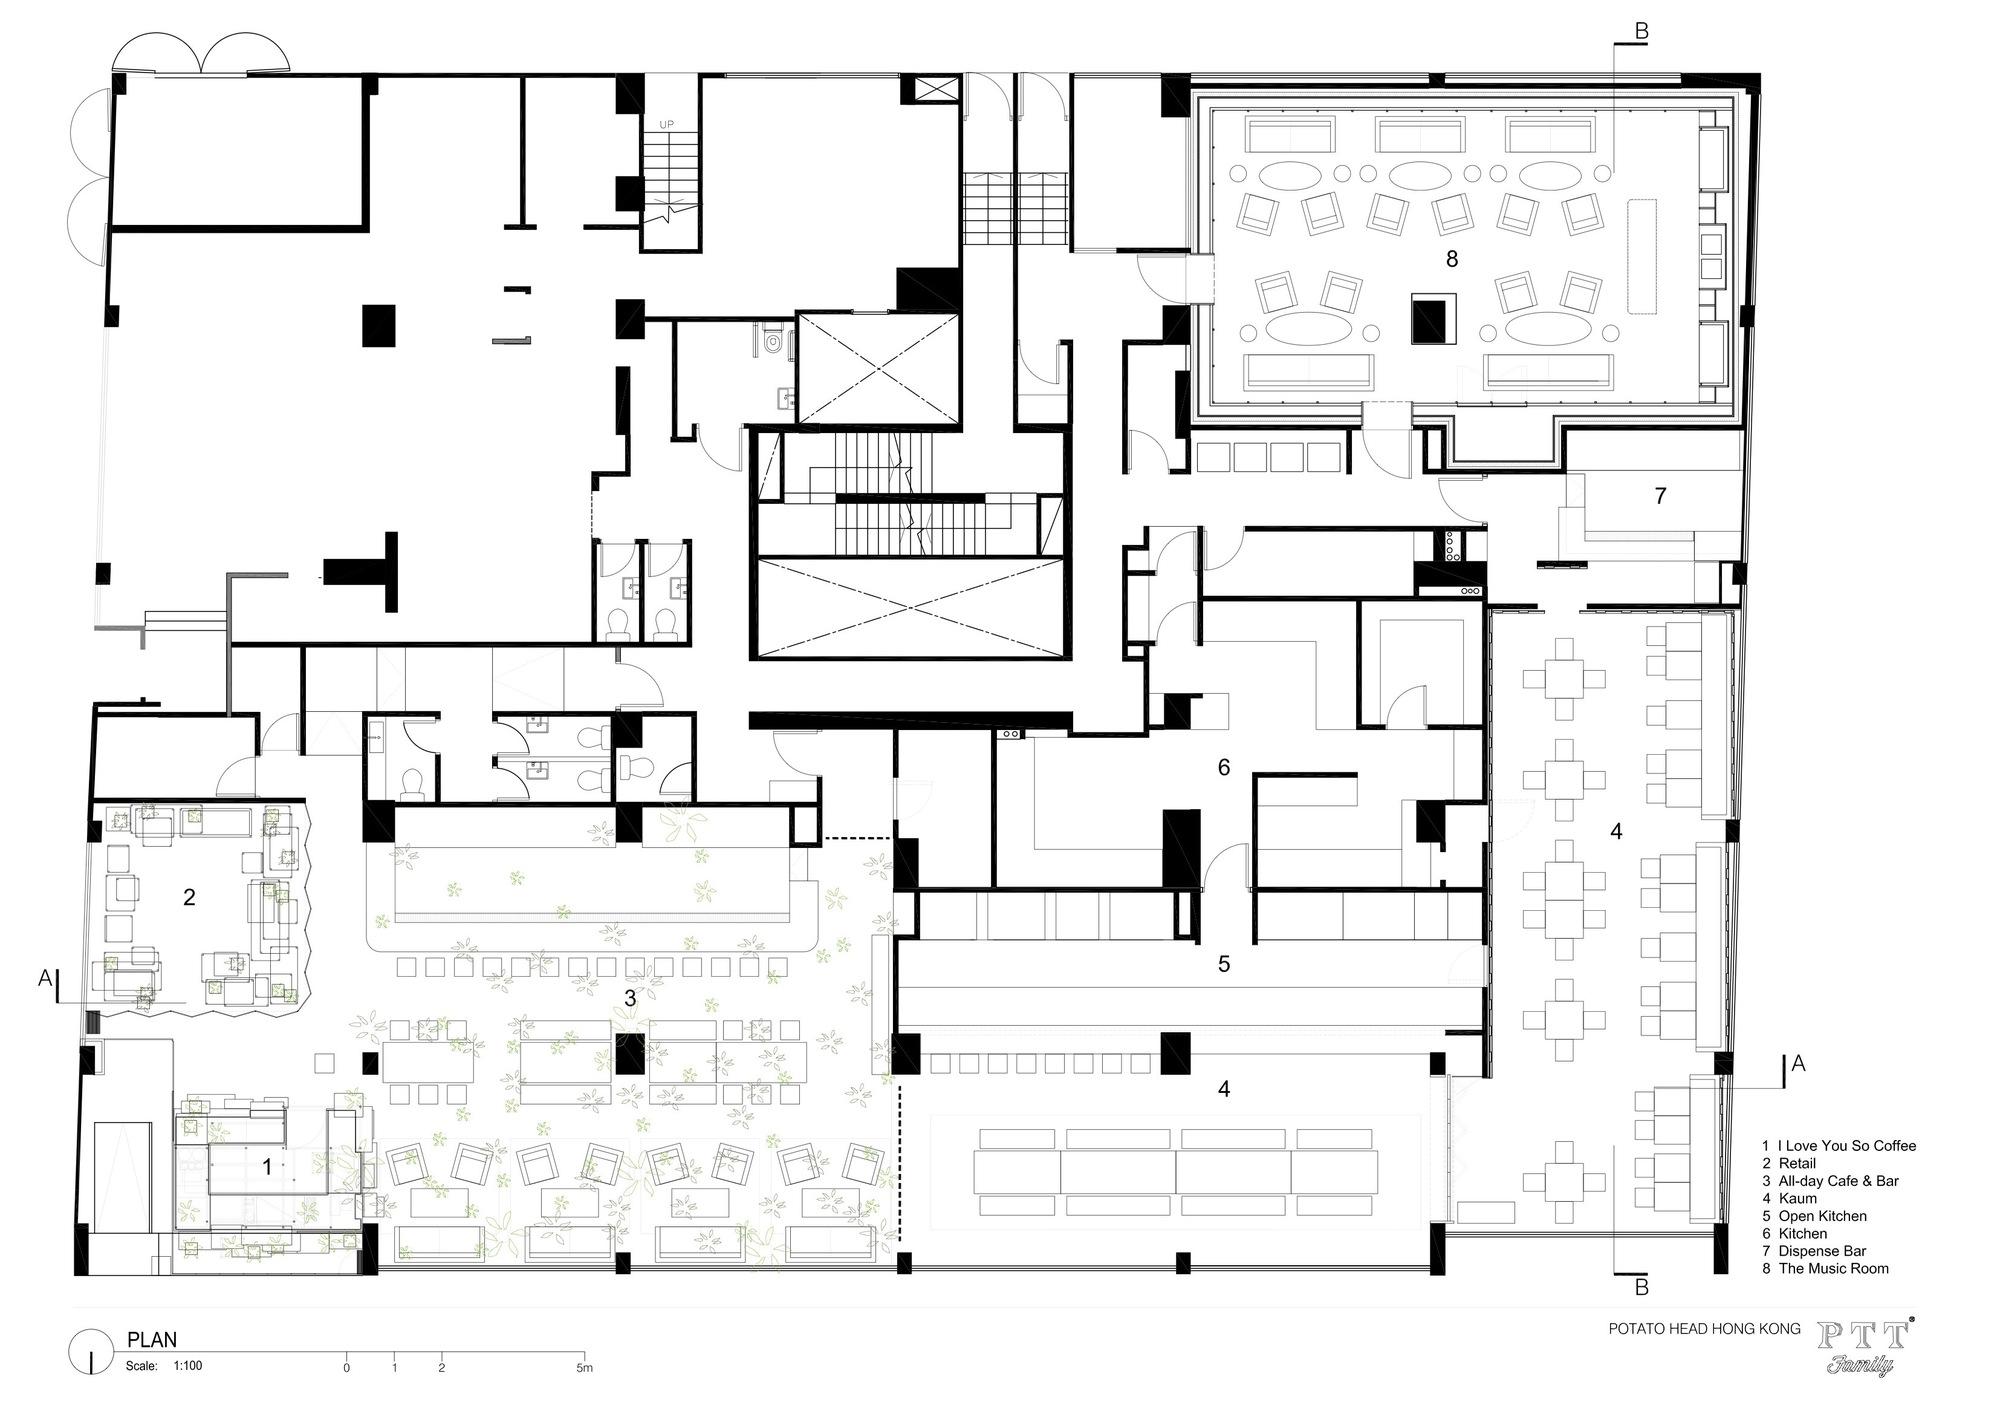 Phhk General Layout 1466780821 Earth Berm Home Design 6 On Earth Berm Home Design